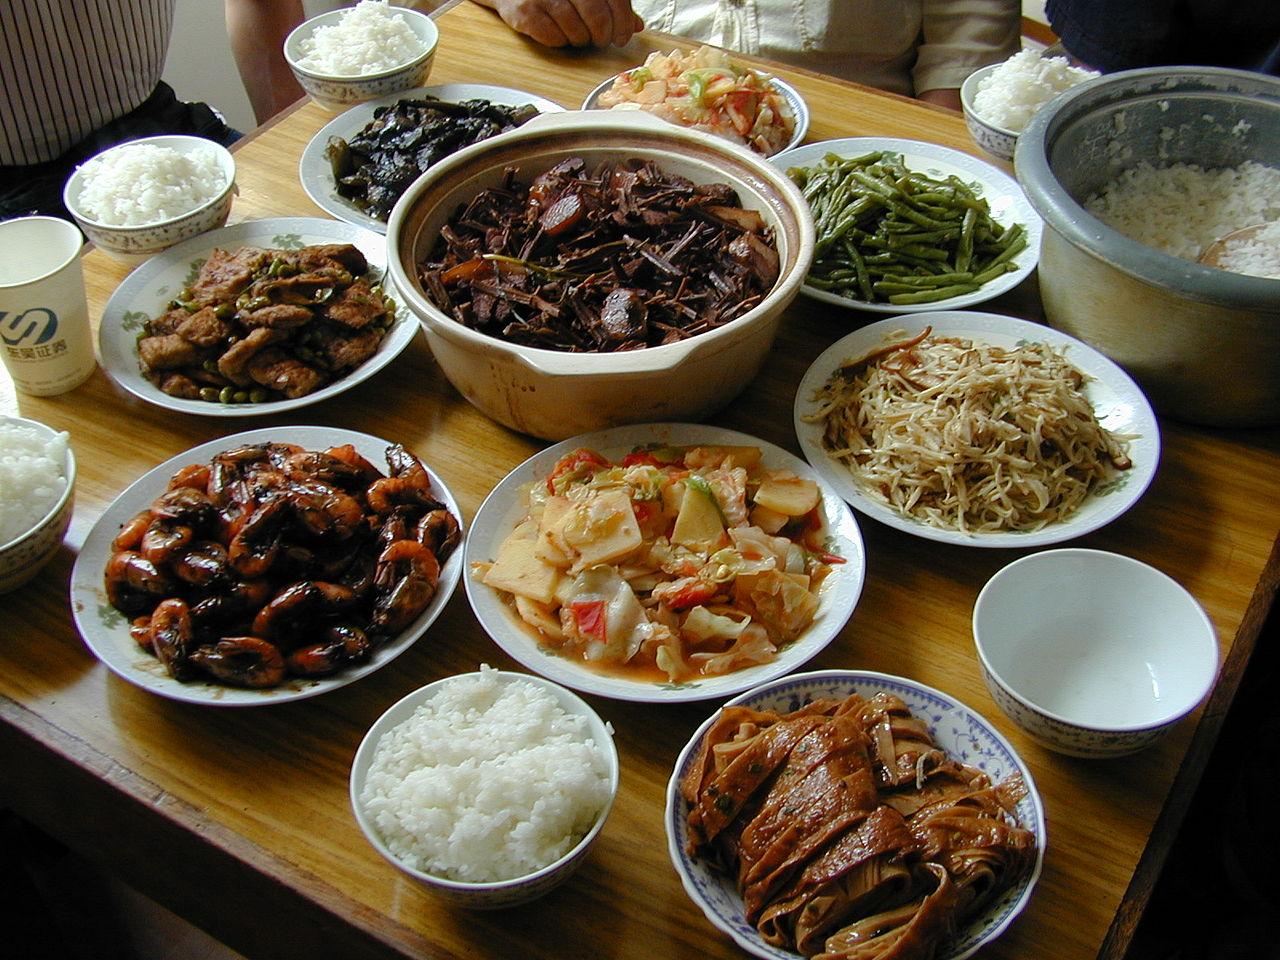 China Restaurant Graz: chinese food: Wok, Ingwer, Kiwano im Pavillon